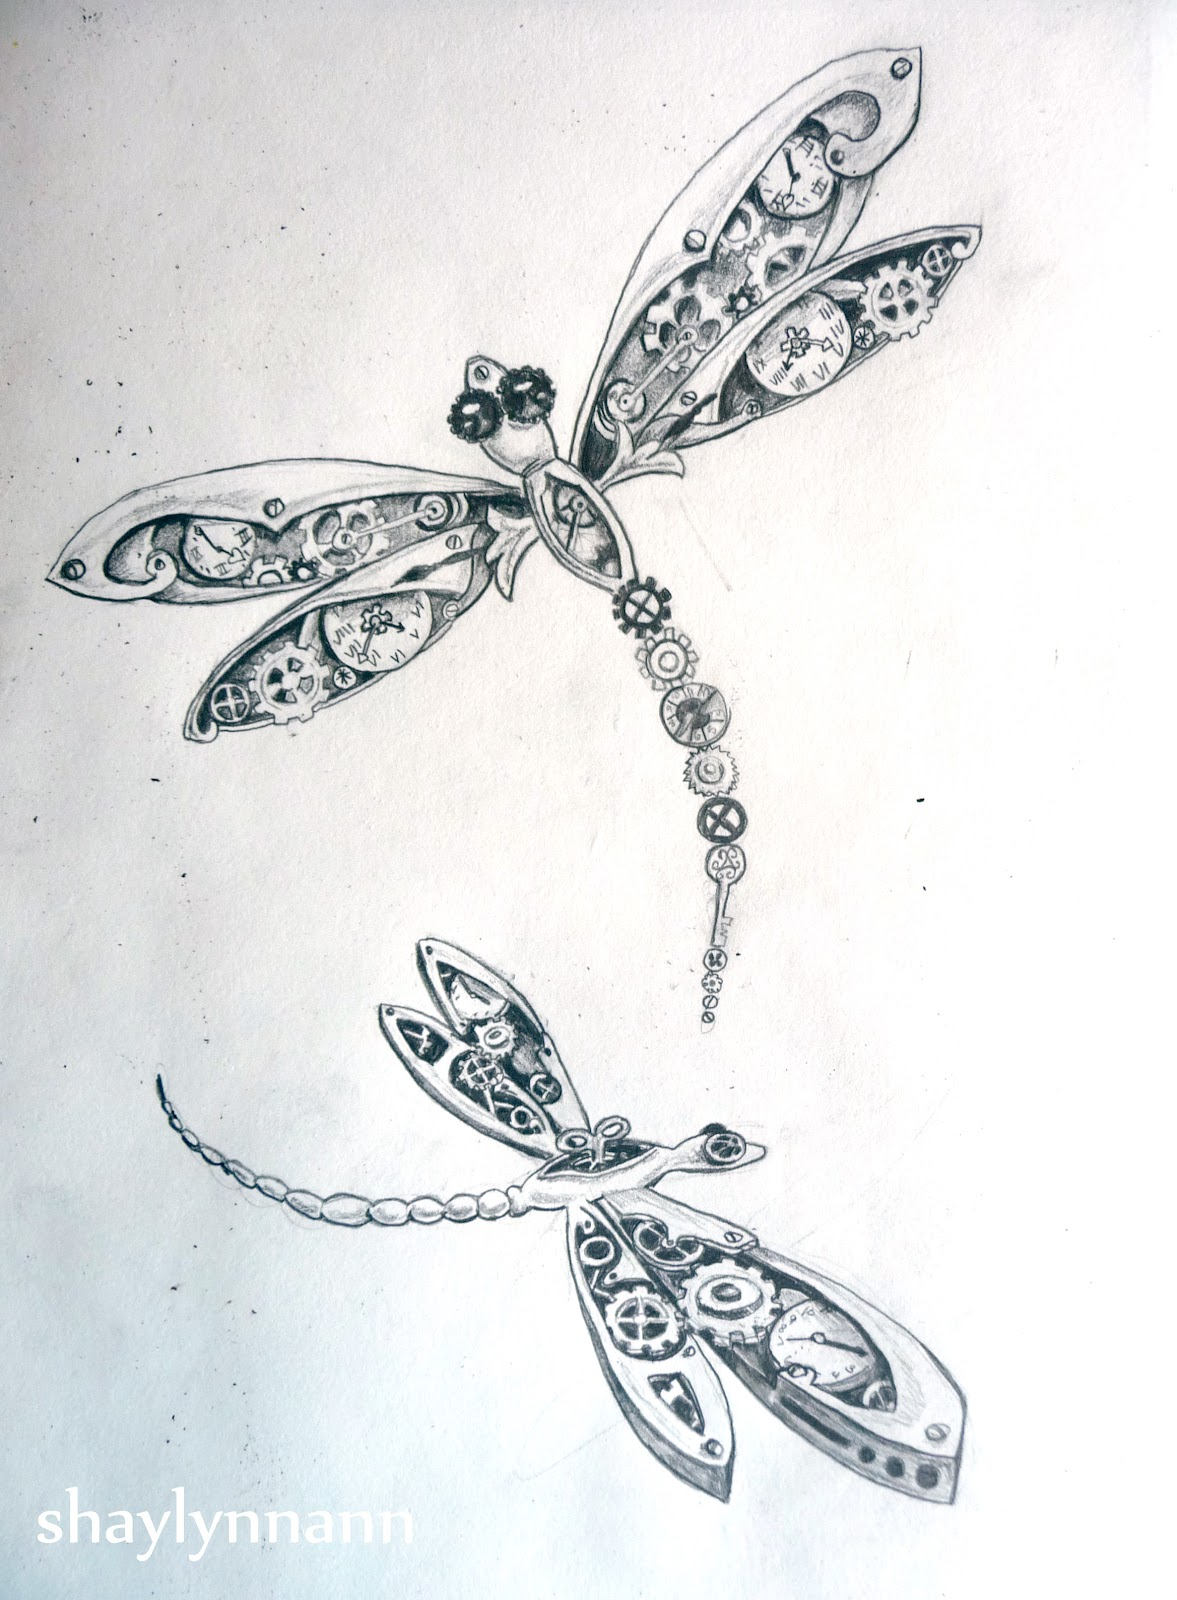 Drawn samurai dragonfly Newest jpg idea captures steampunk_clockwork_raven_wip_by_ephygenia